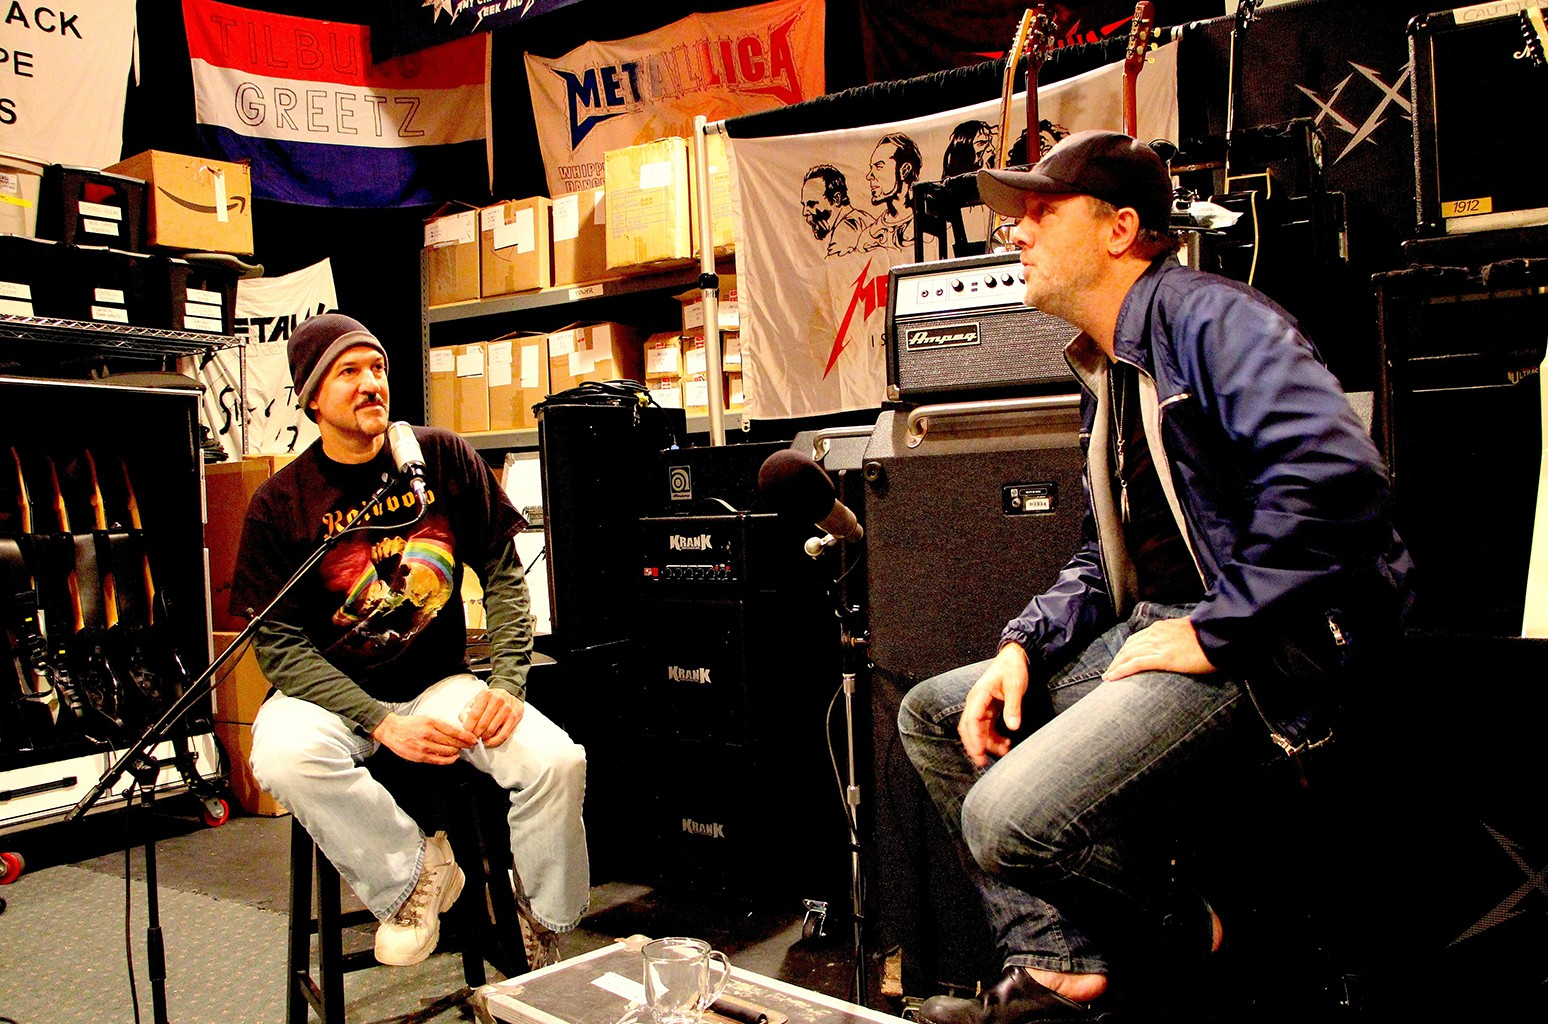 Bob Nalbandian interviewing Lars Ulrich of Metallica